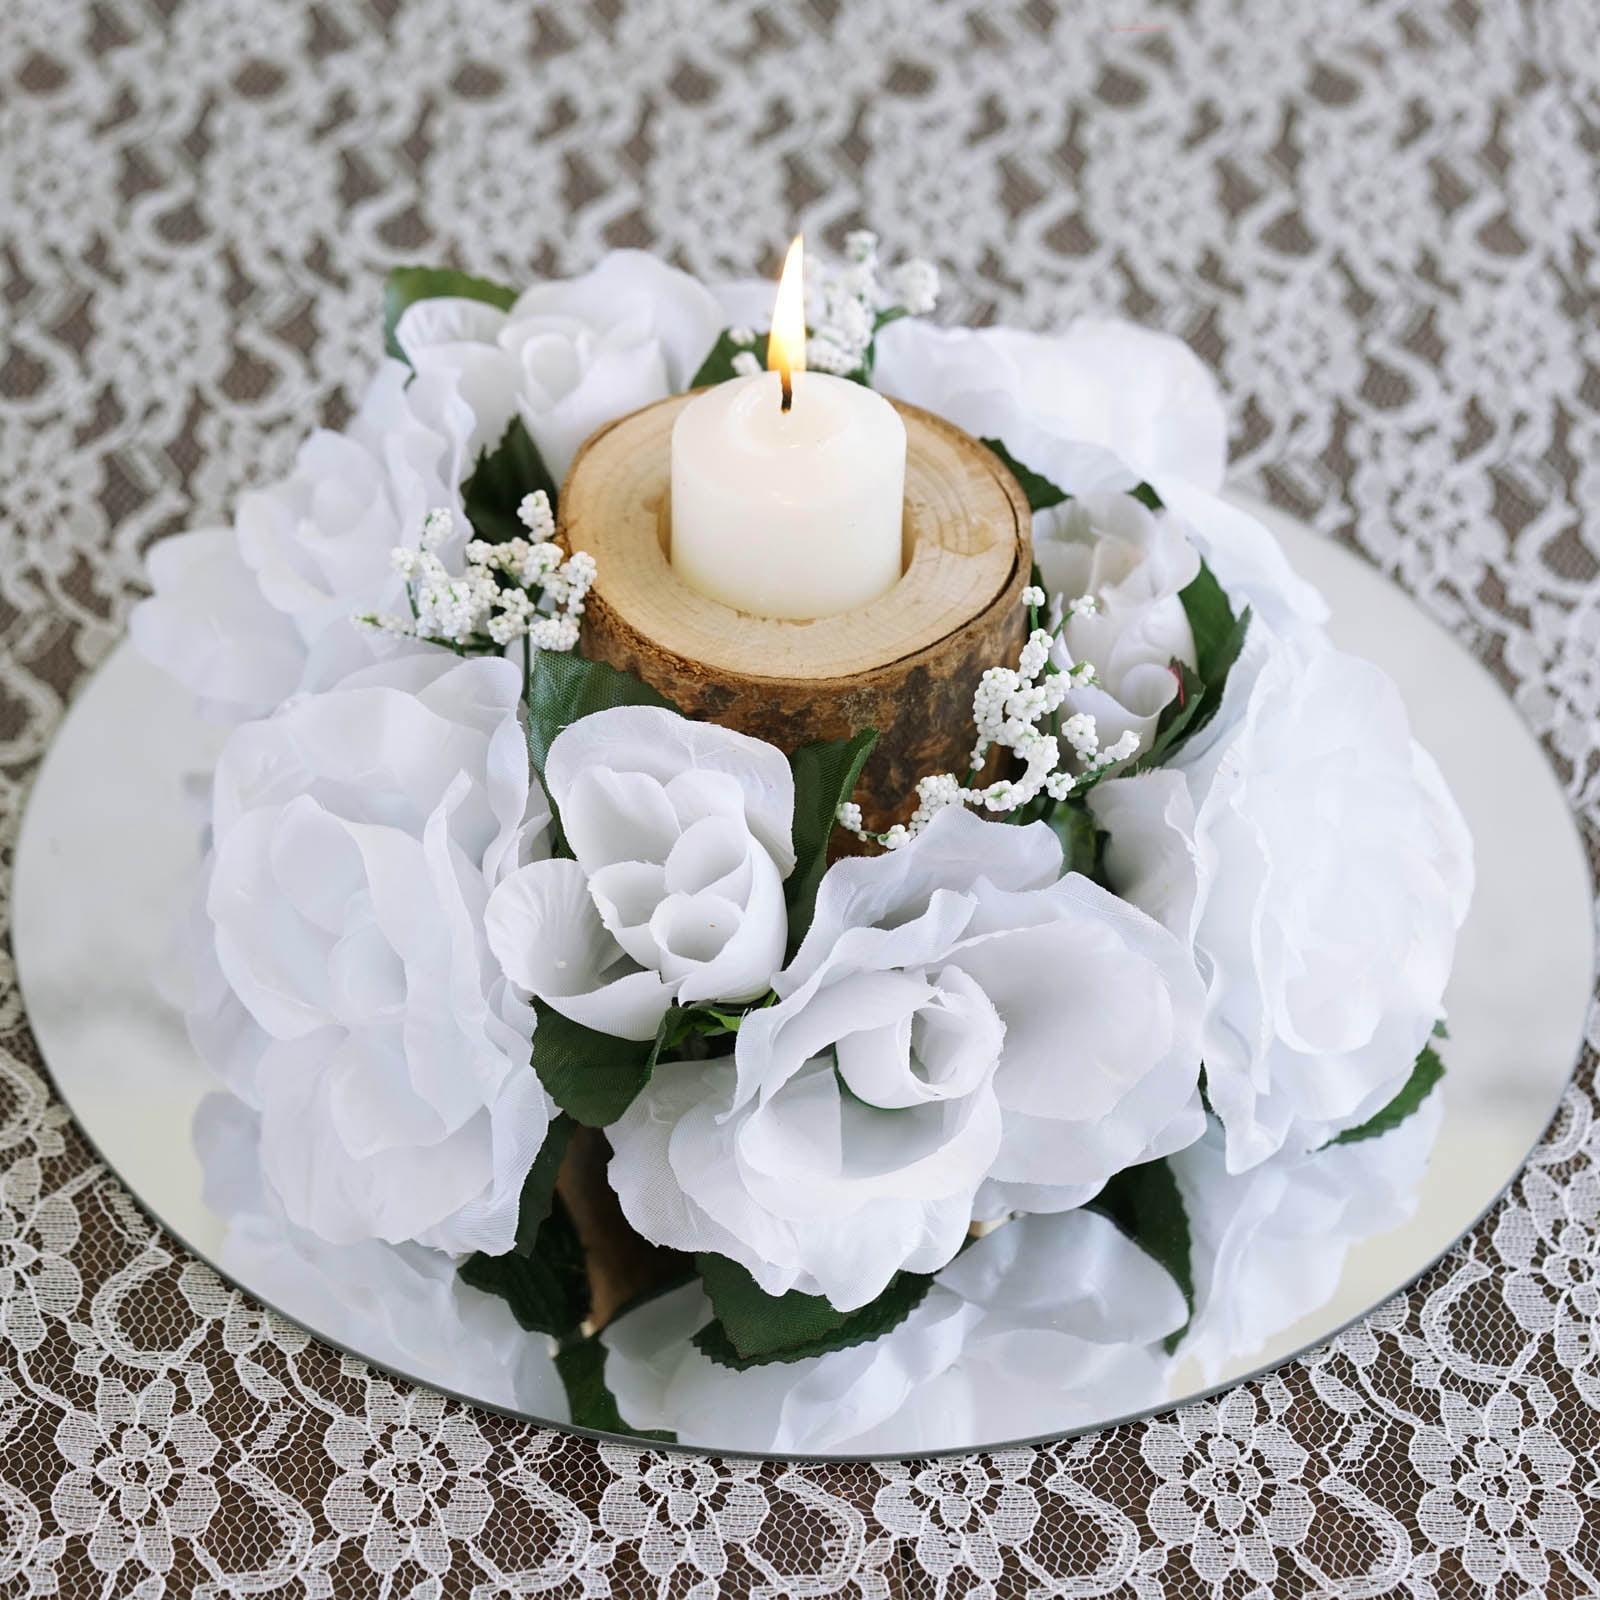 BalsaCircle 8 Silk Roses Flowers Candle Rings - DIY Home Wedding ...